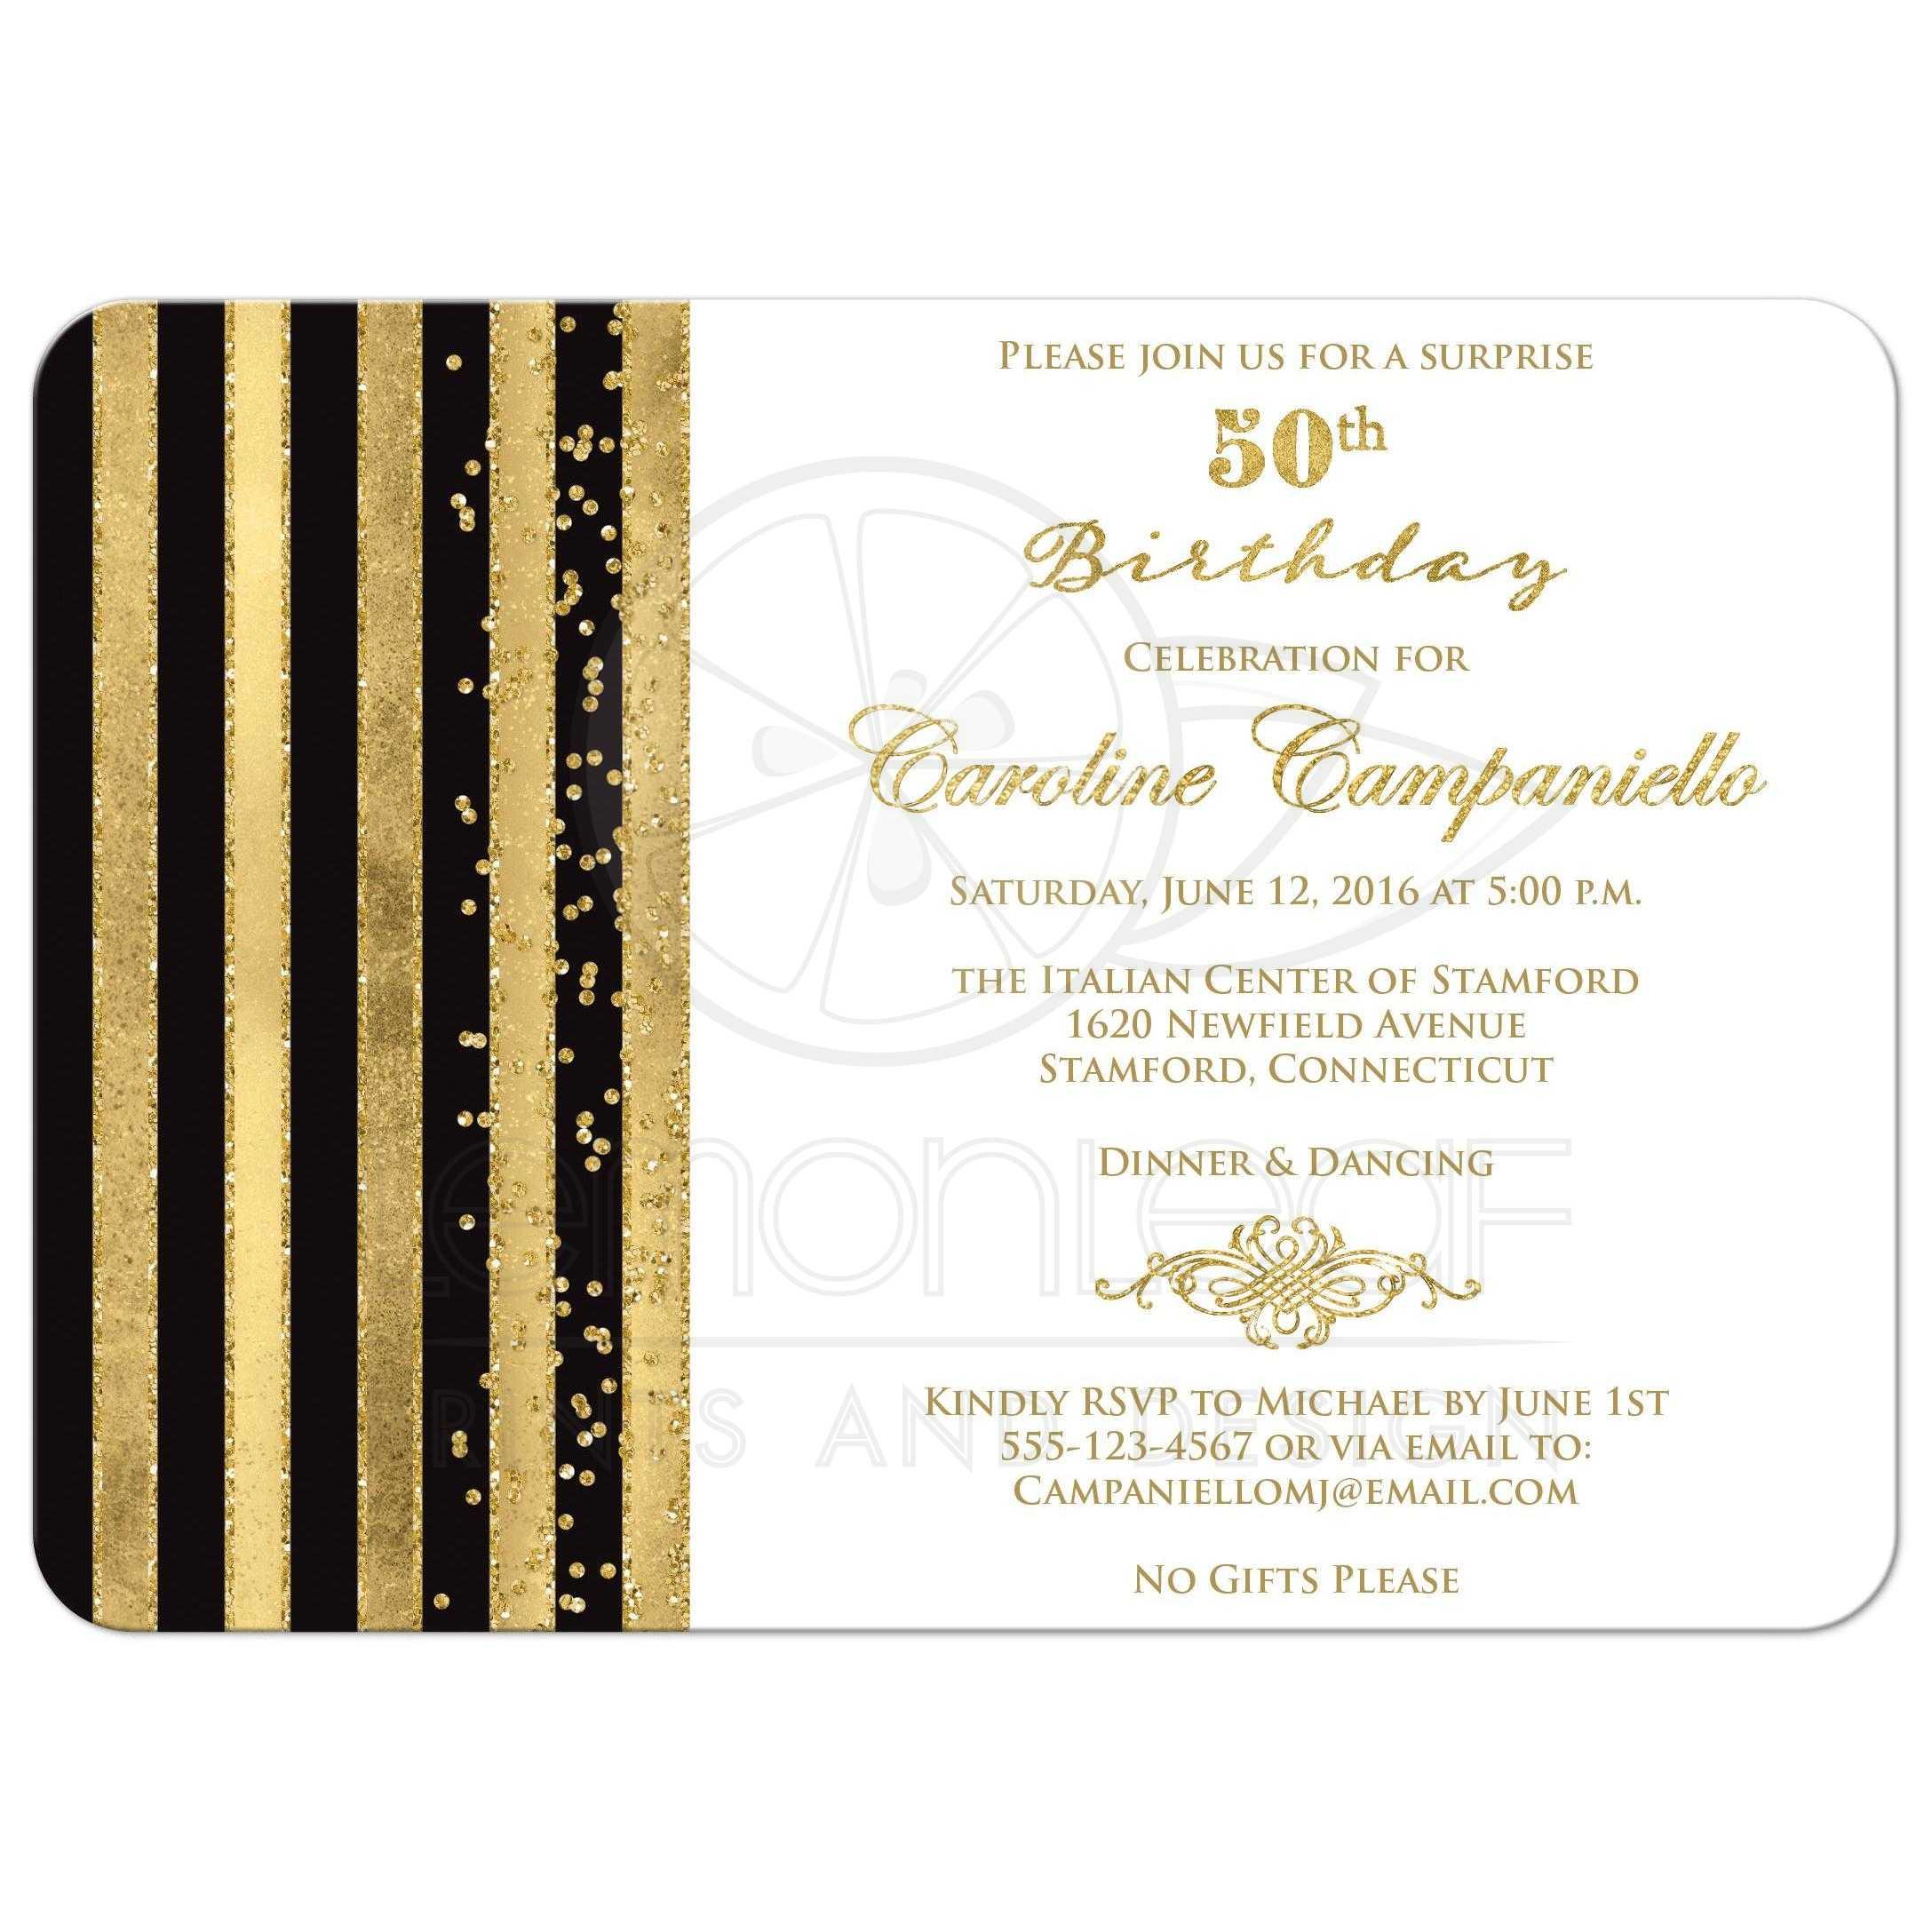 50th birthday invitation black white gold stripes faux glitter simulated gold foil scroll